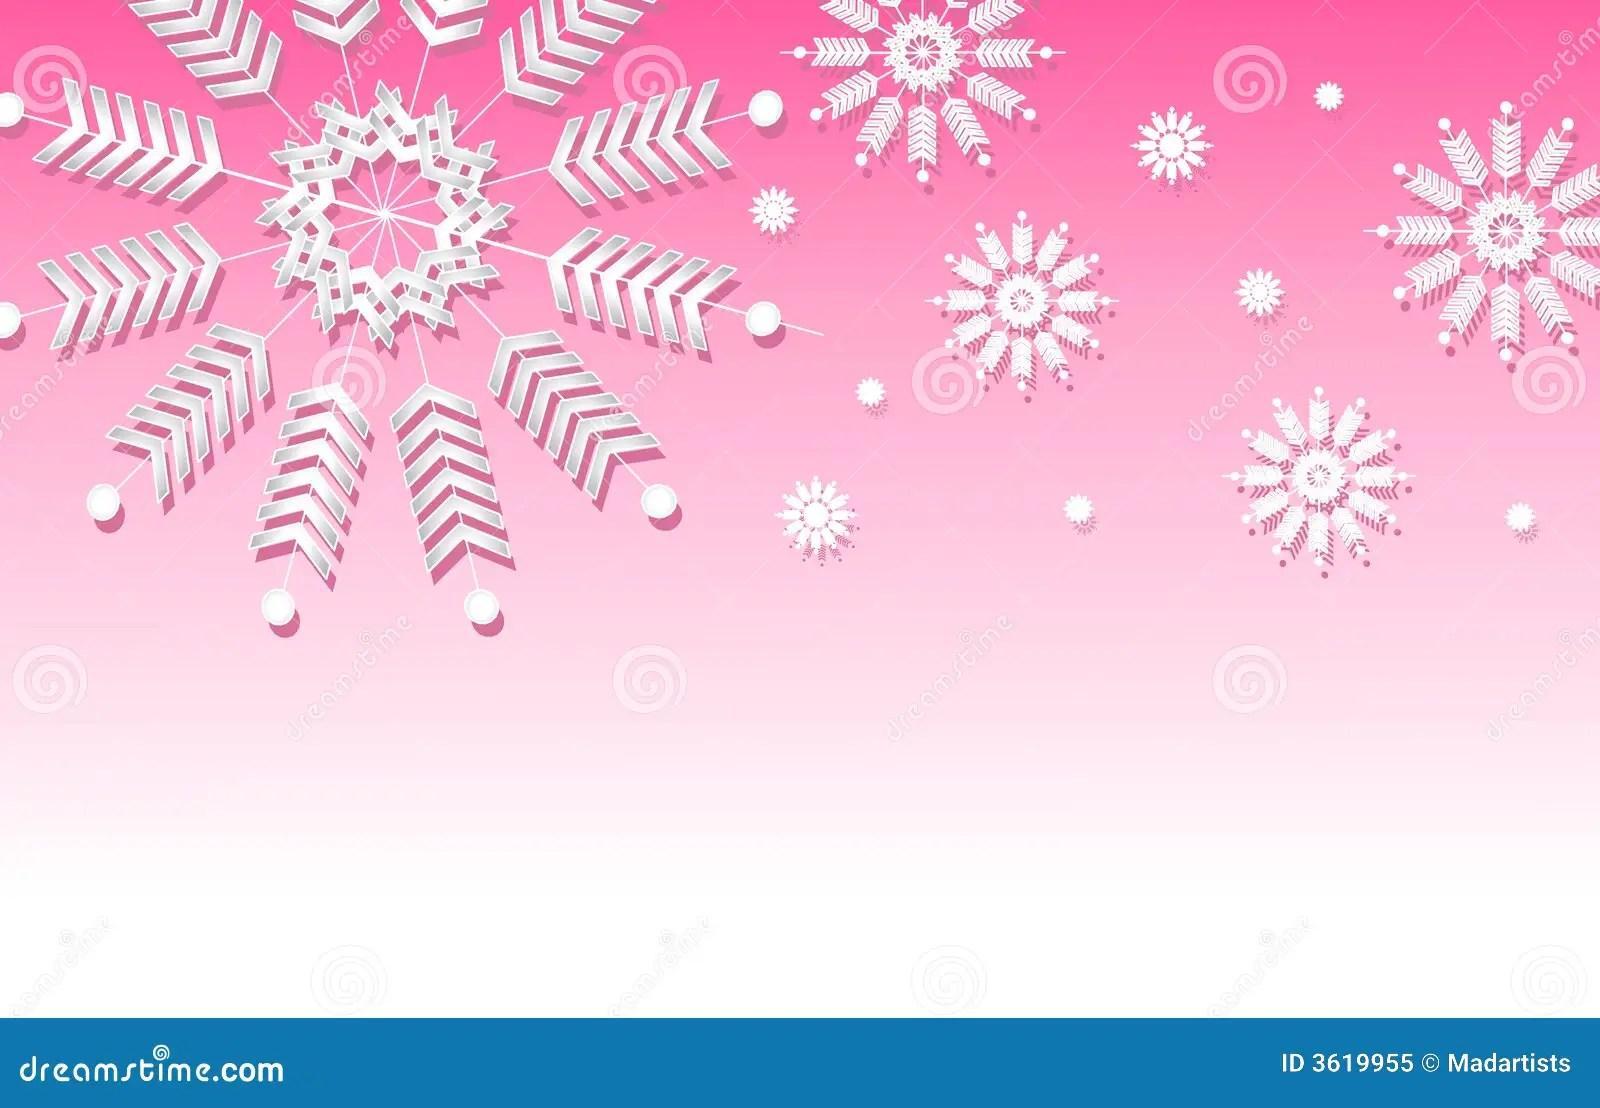 Snow Falling Wallpaper Download Pink Snowflake Background Border Stock Illustration